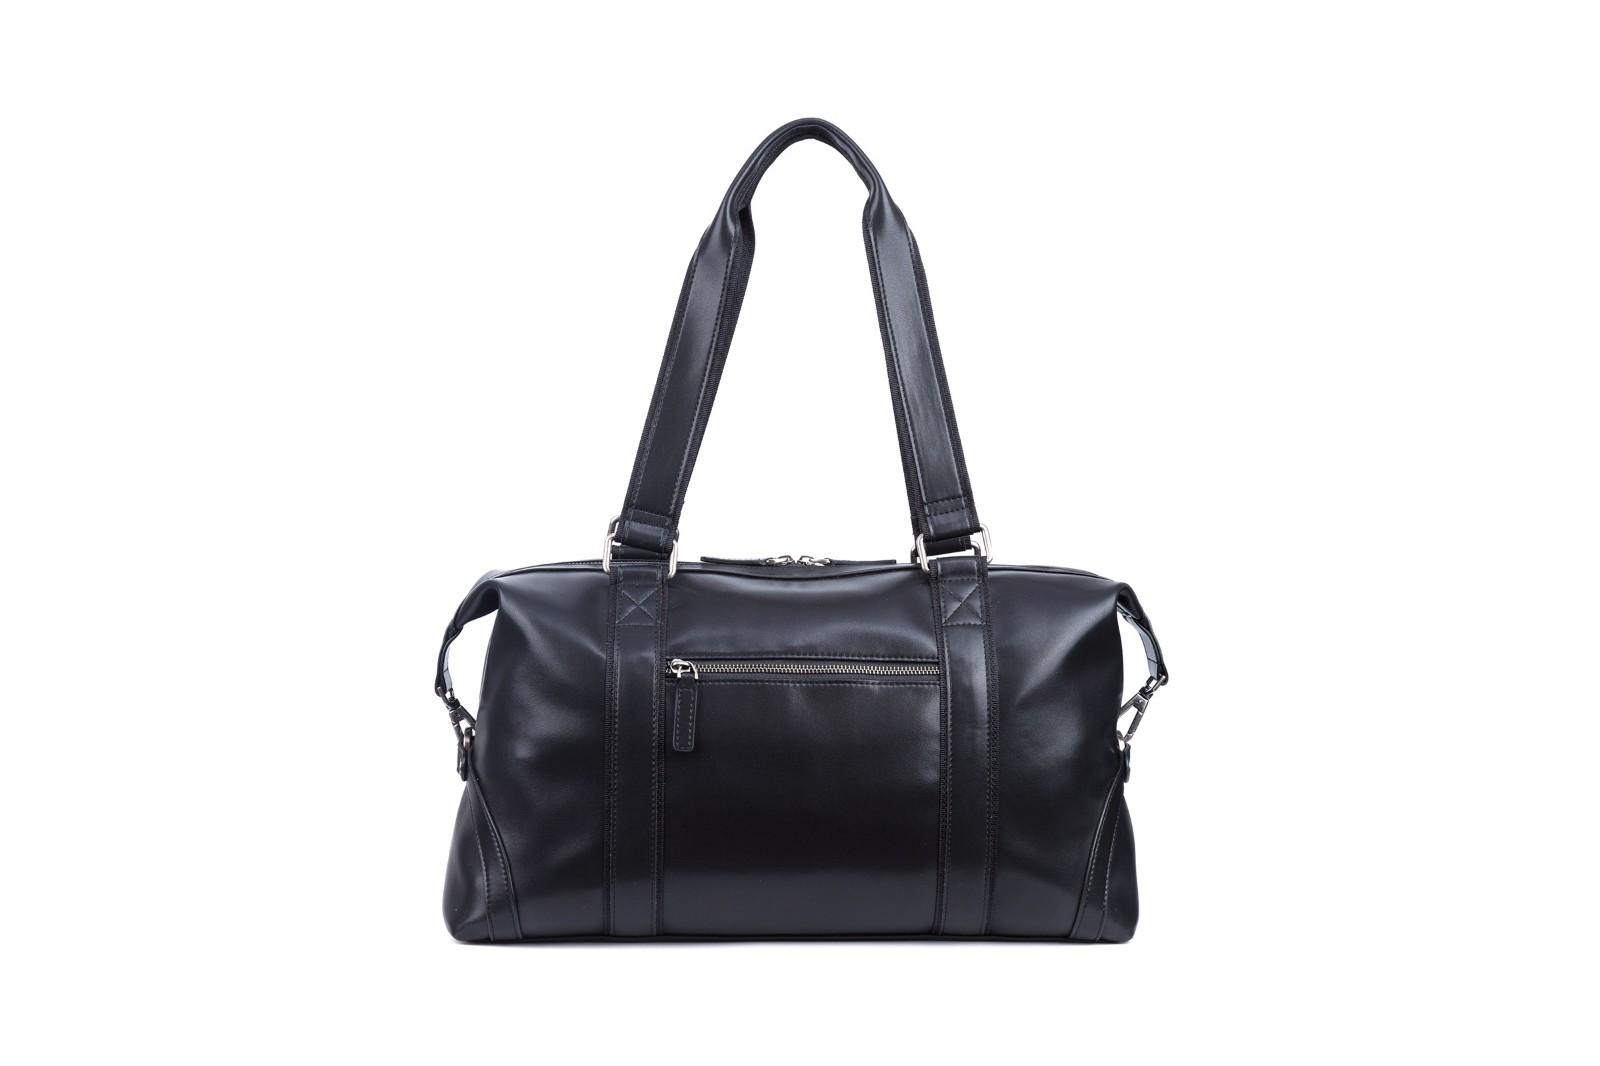 GF bags-Leather Duffle Bag Mens Duffle Leather Handle Metal Zipper Closure-4